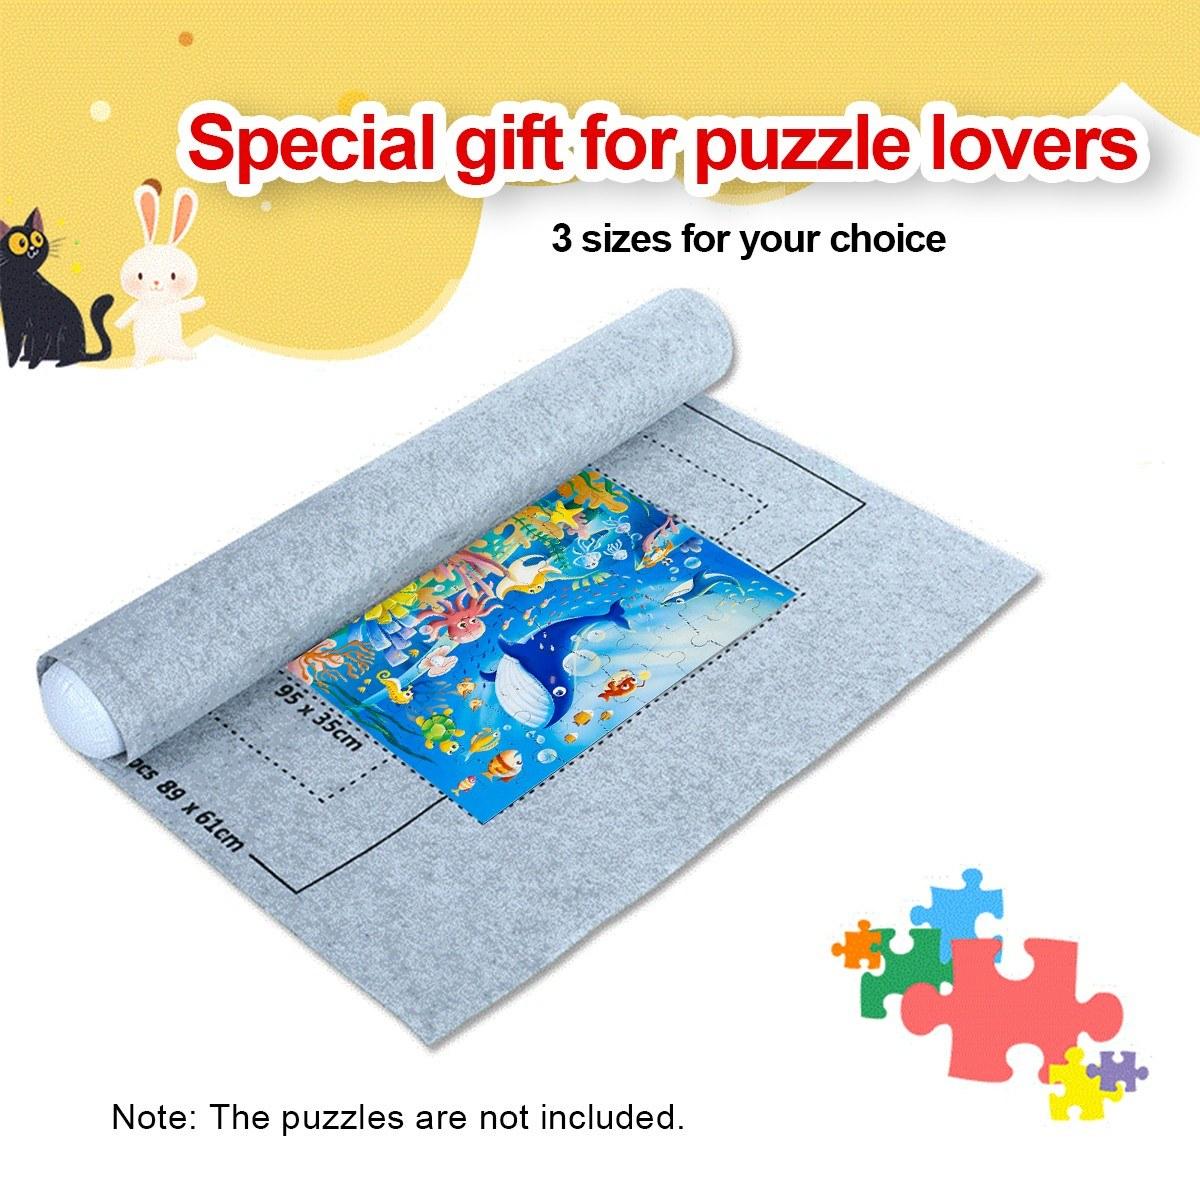 1500 Stück Puzzle Aufbewahrungsmatte Roll Up Puzzle Filz Spiel 26*46 Mat Kinder